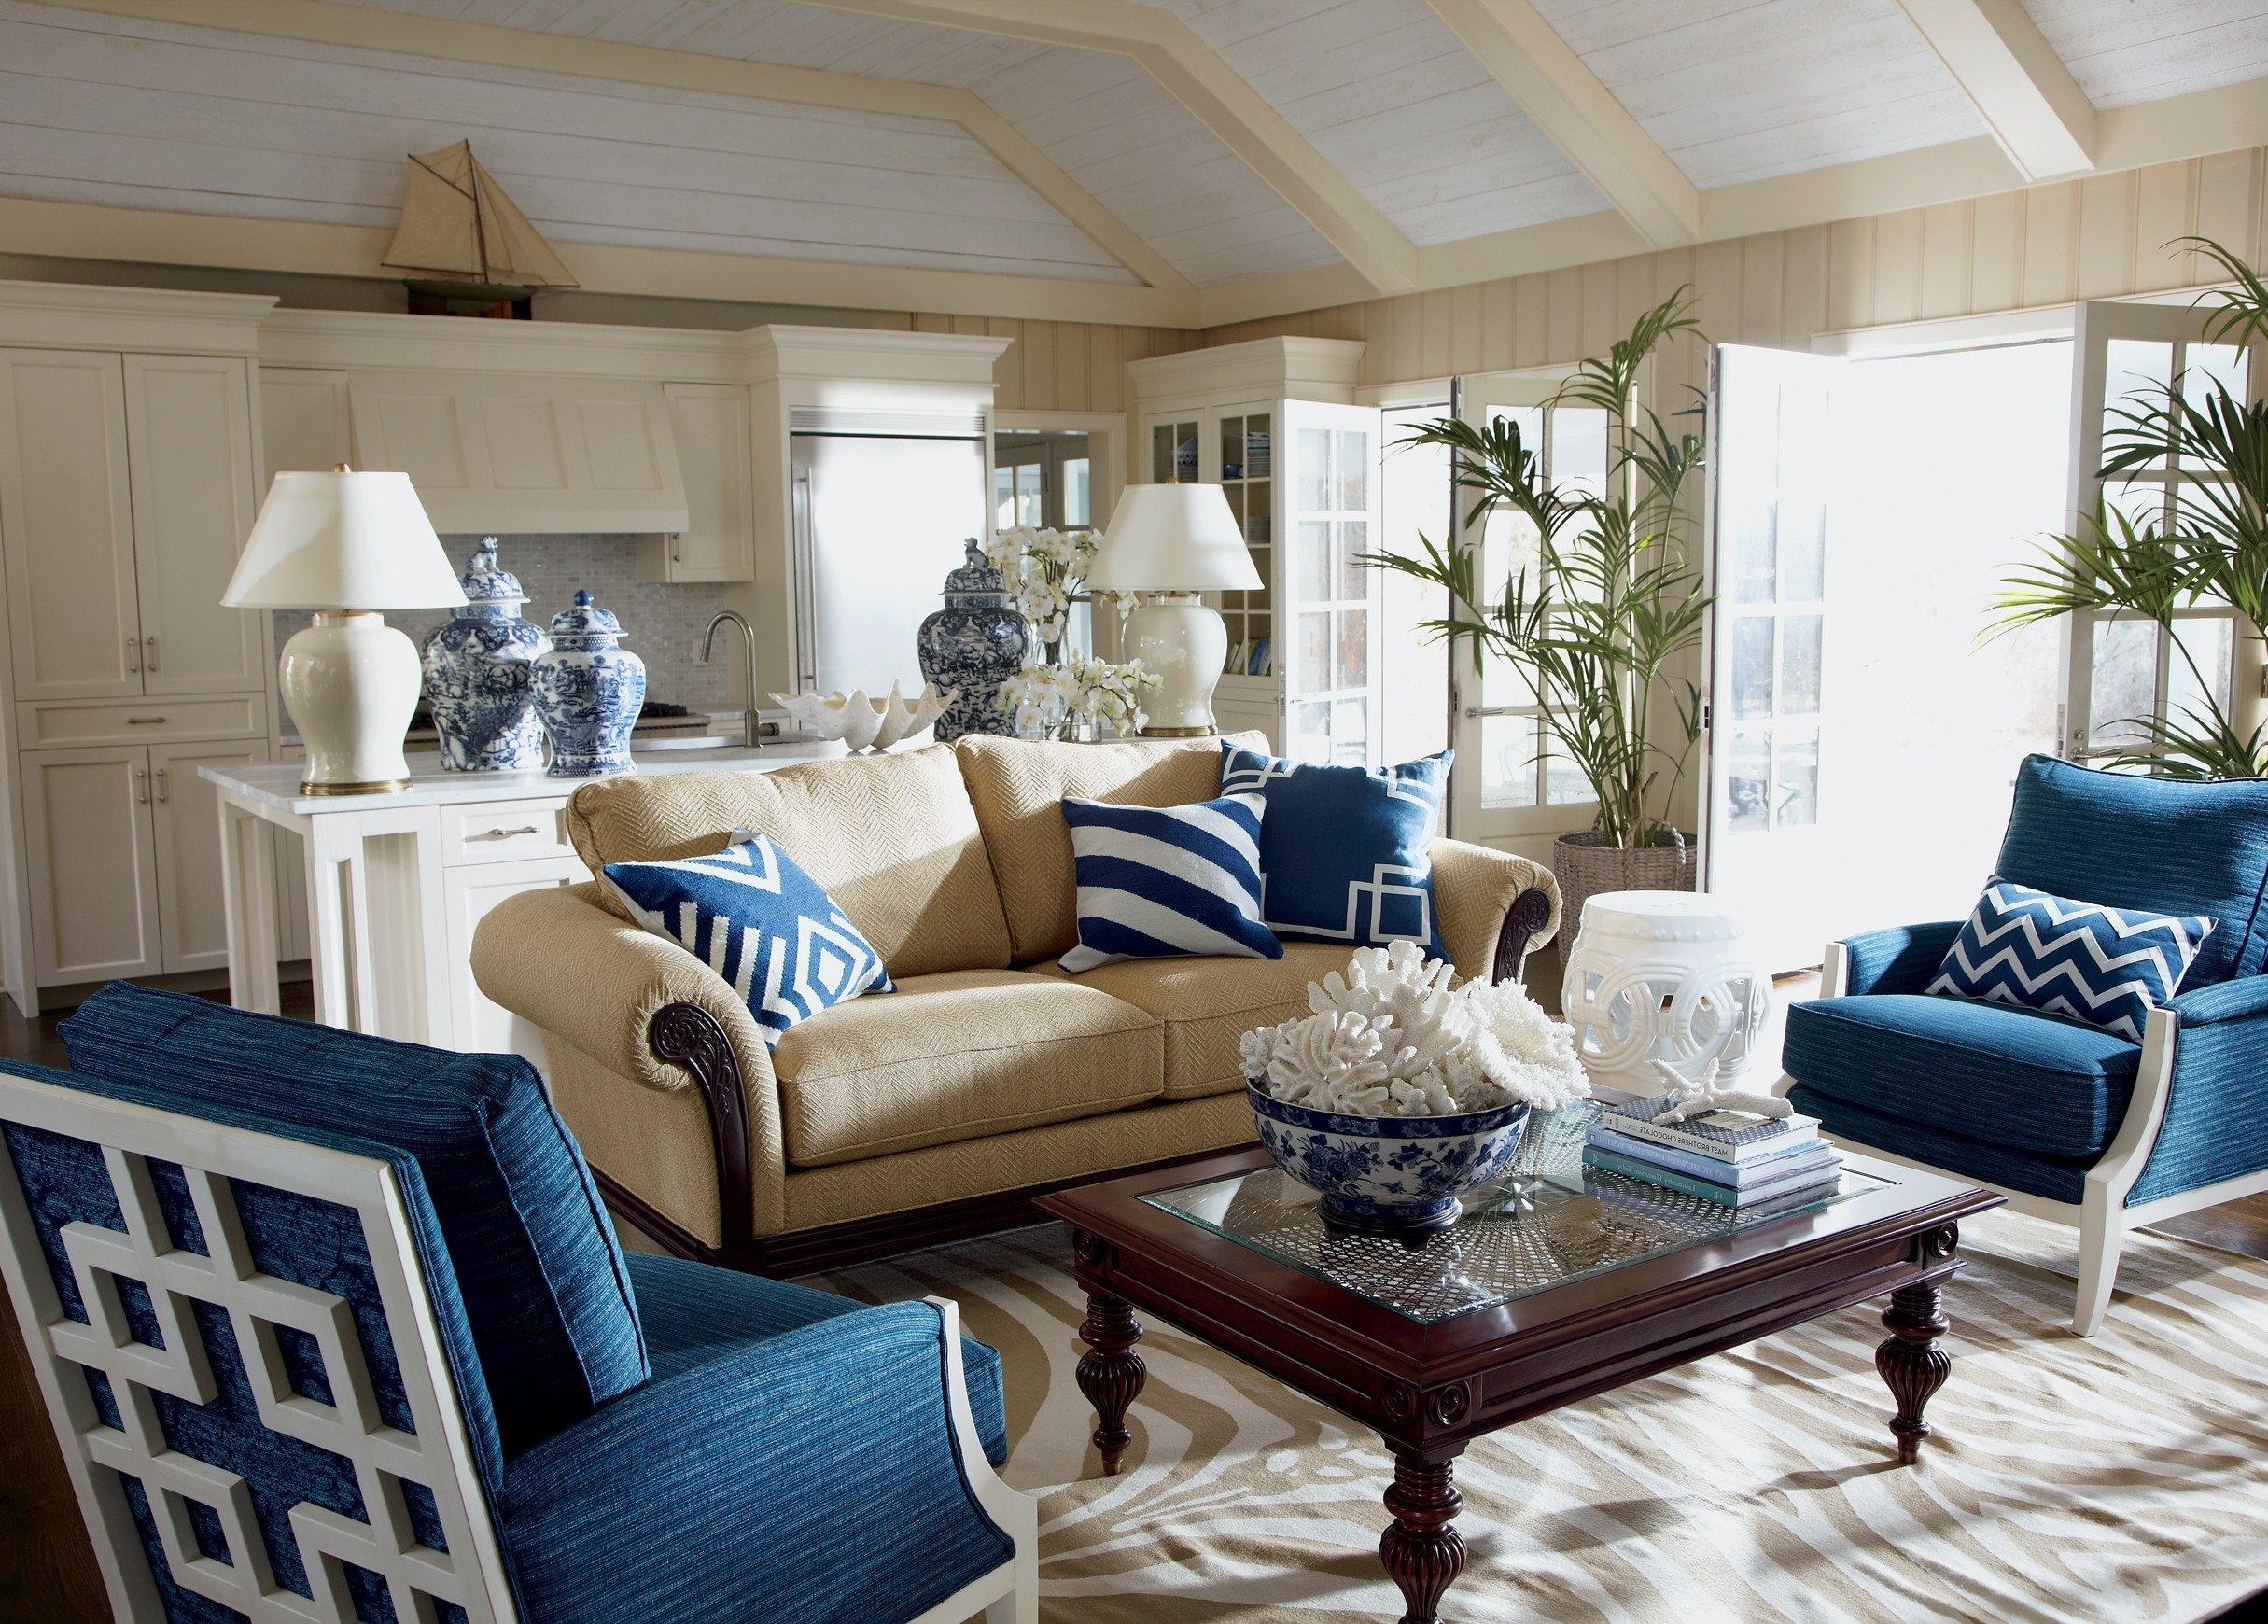 Small Living Room Setup Ideas 25 Living Room Setup Ideas for Small to Plete Your